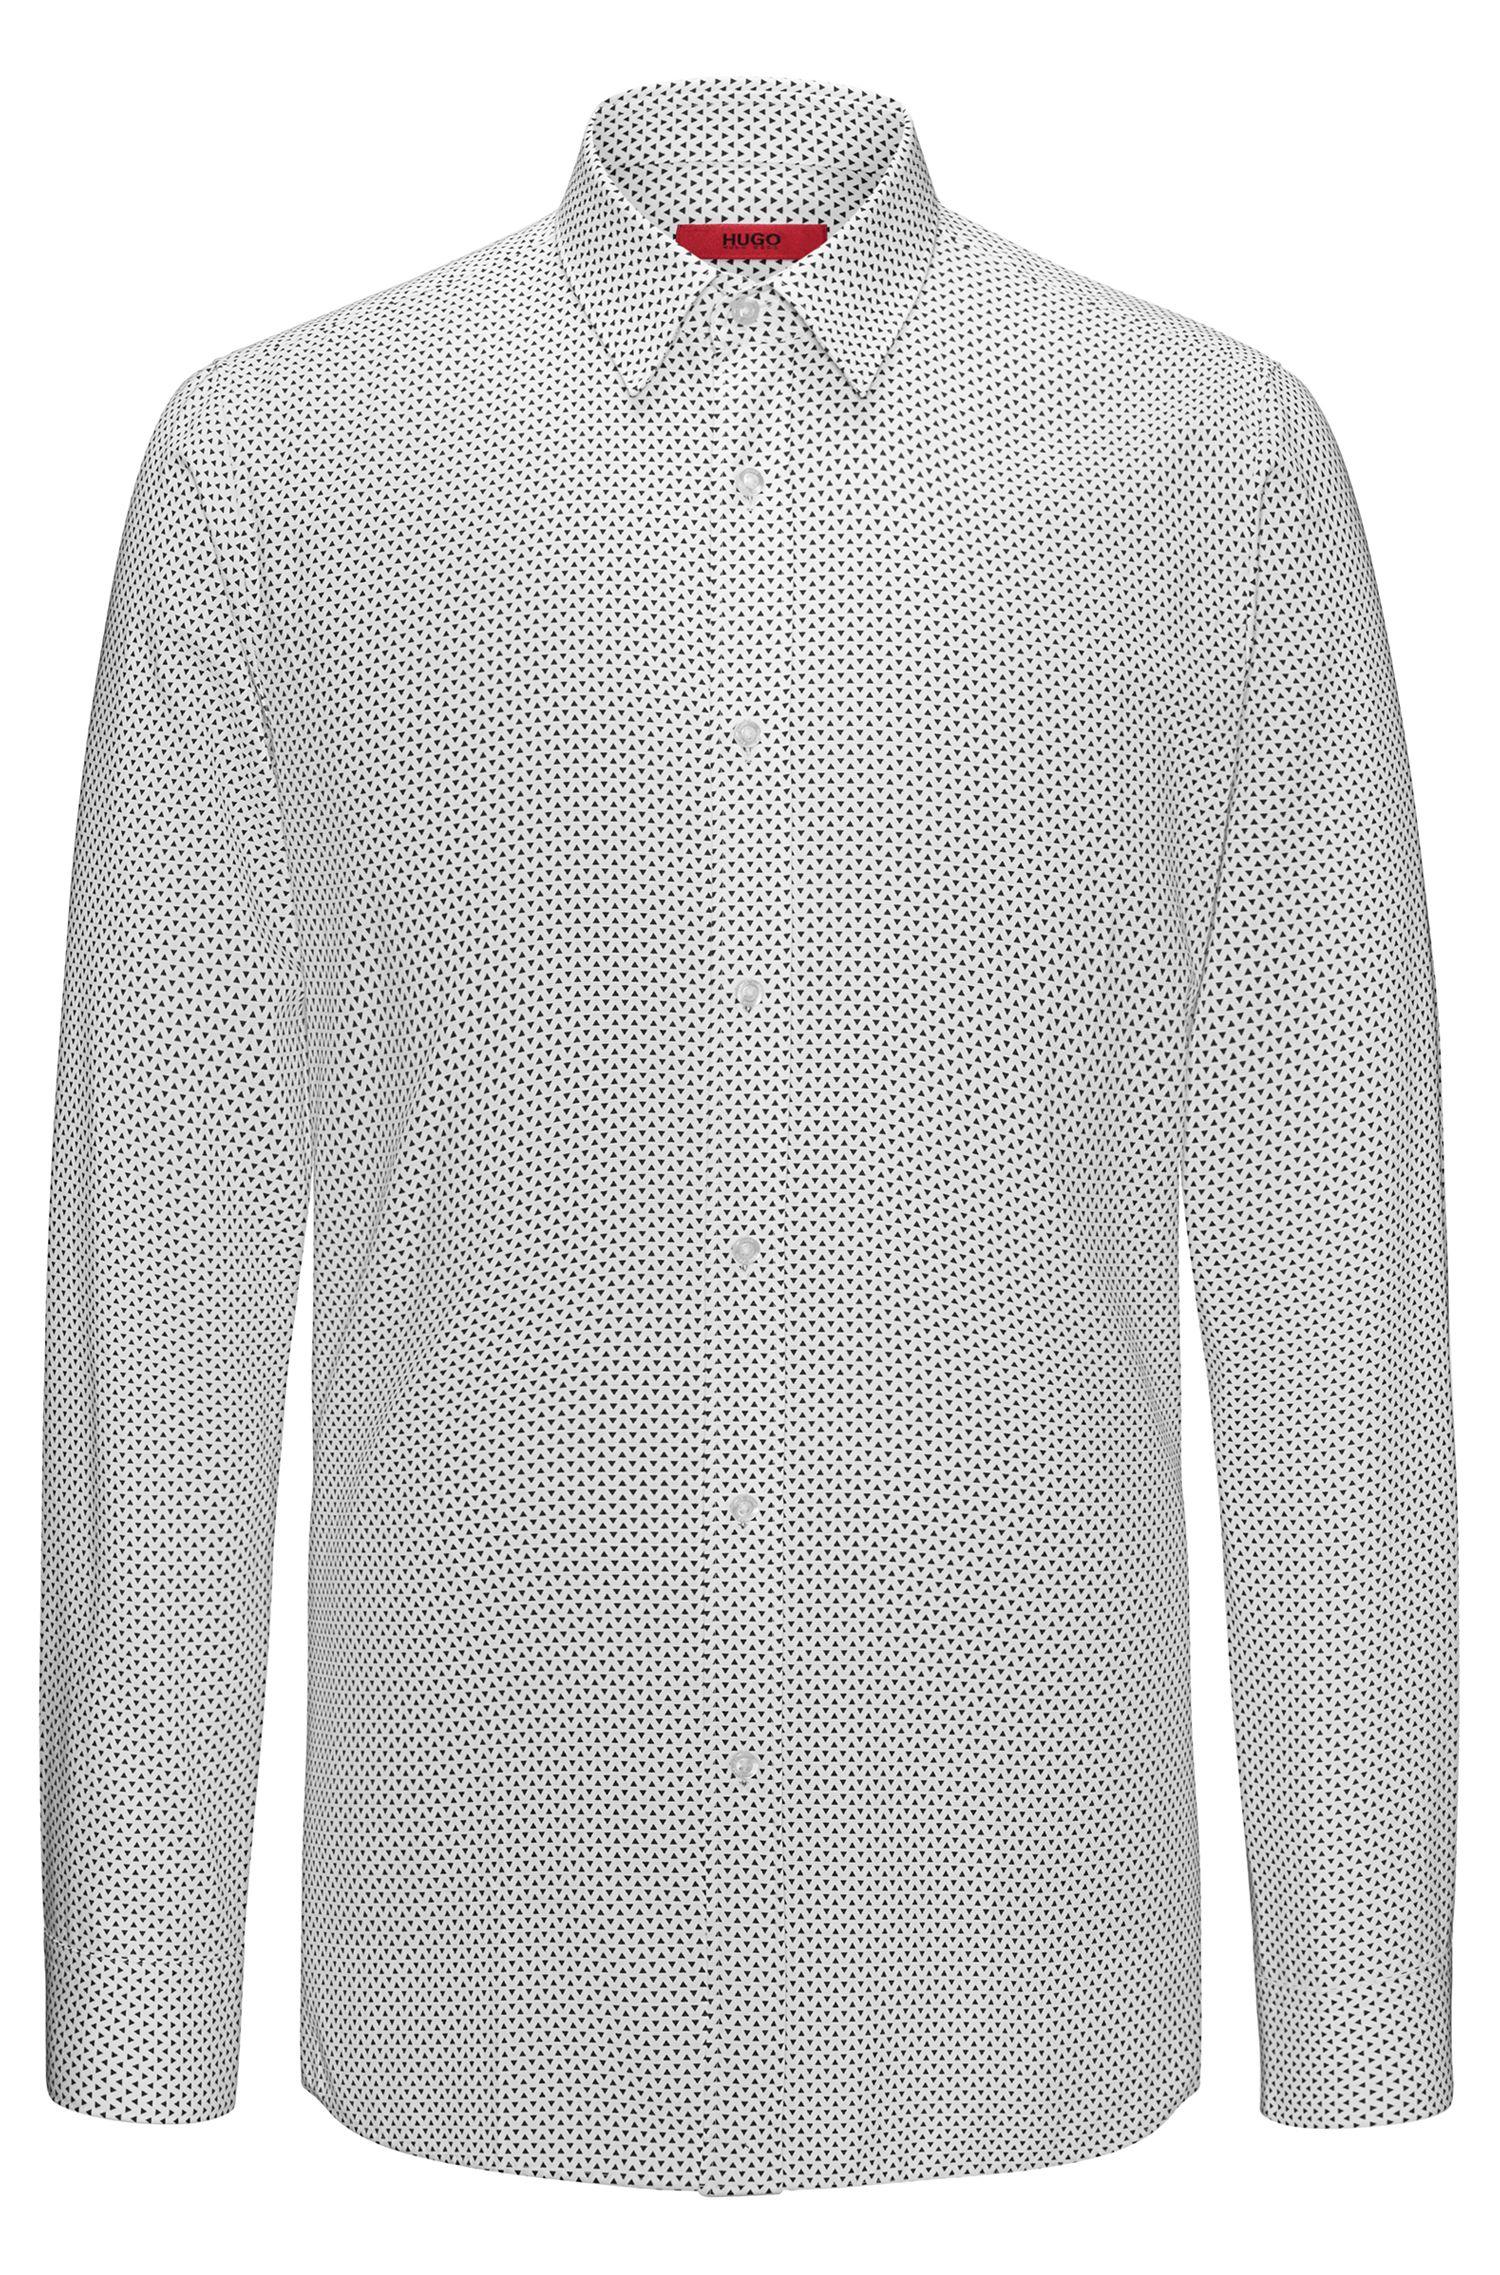 Triangle-Print Cotton Sport Shirt, Extra Slim Fit | Elisha